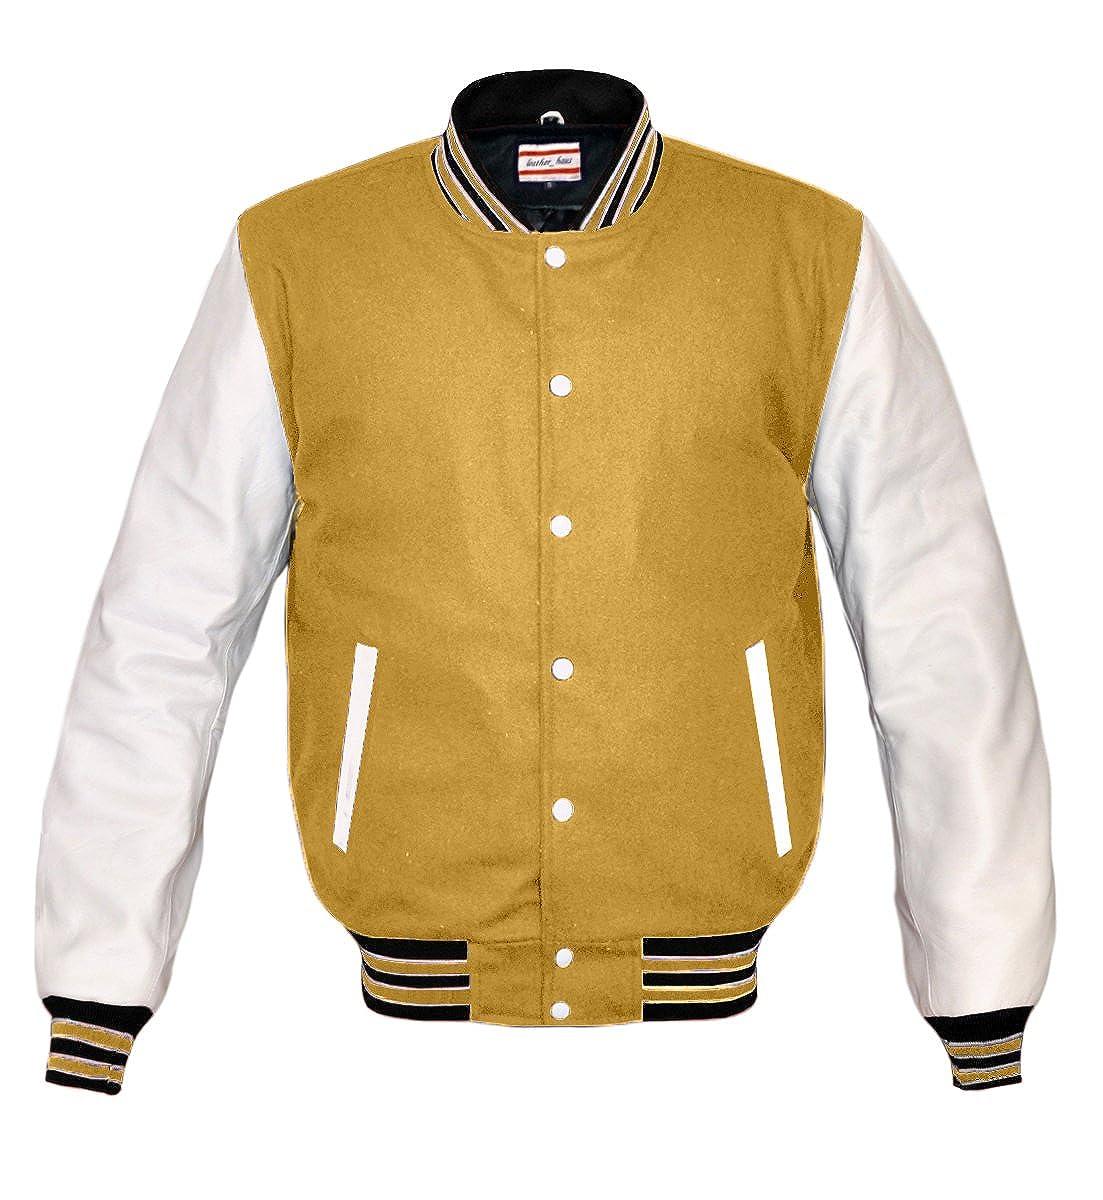 Superb Genuine Leather Sleeve Letterman College Varsity Men Wool Jackets WSL-BWSTR-WB-$P